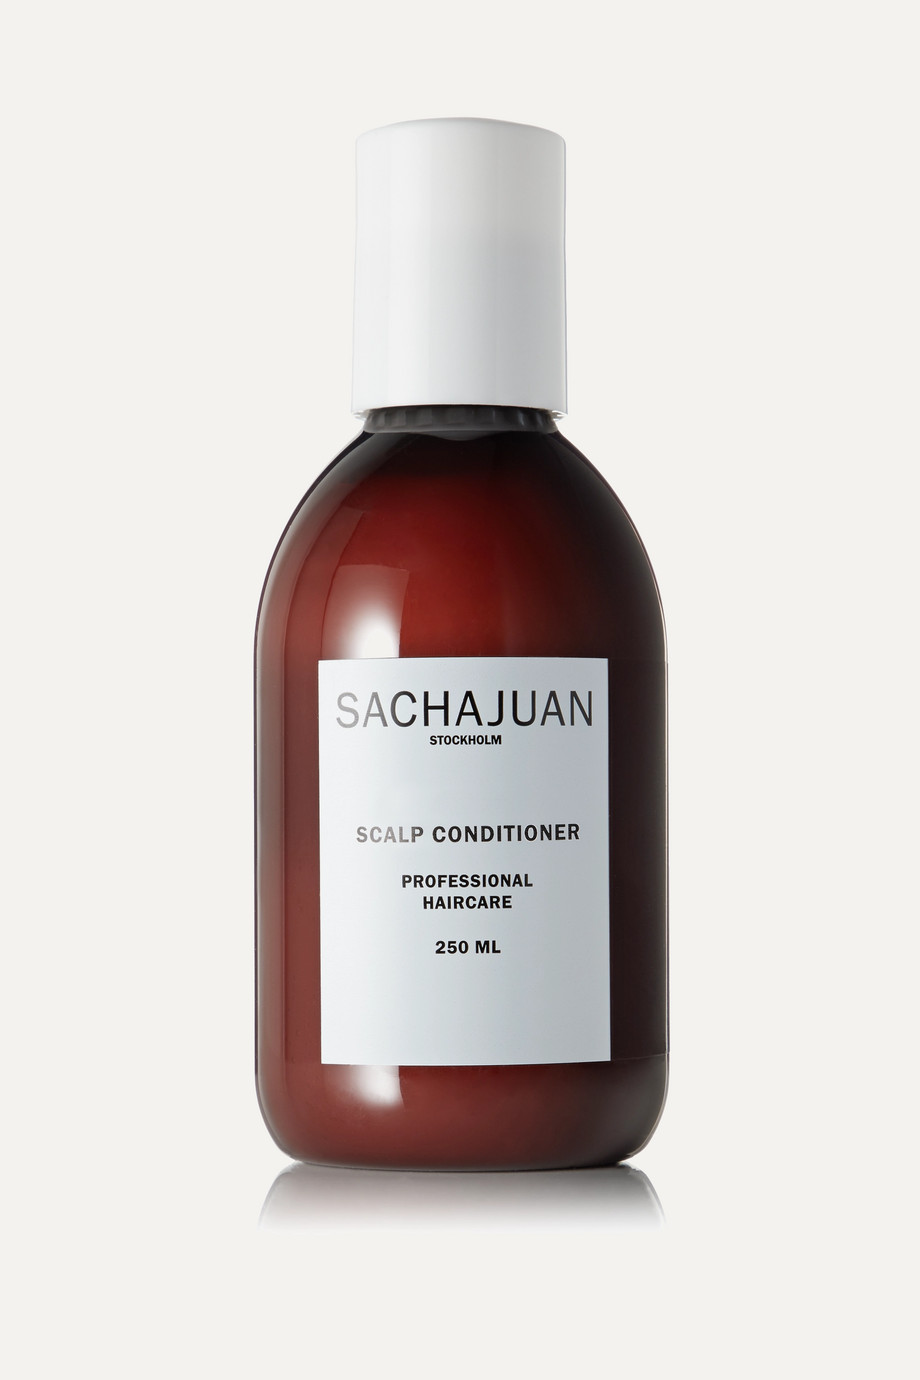 SACHAJUAN Scalp Conditioner, 250 ml - Conditioner